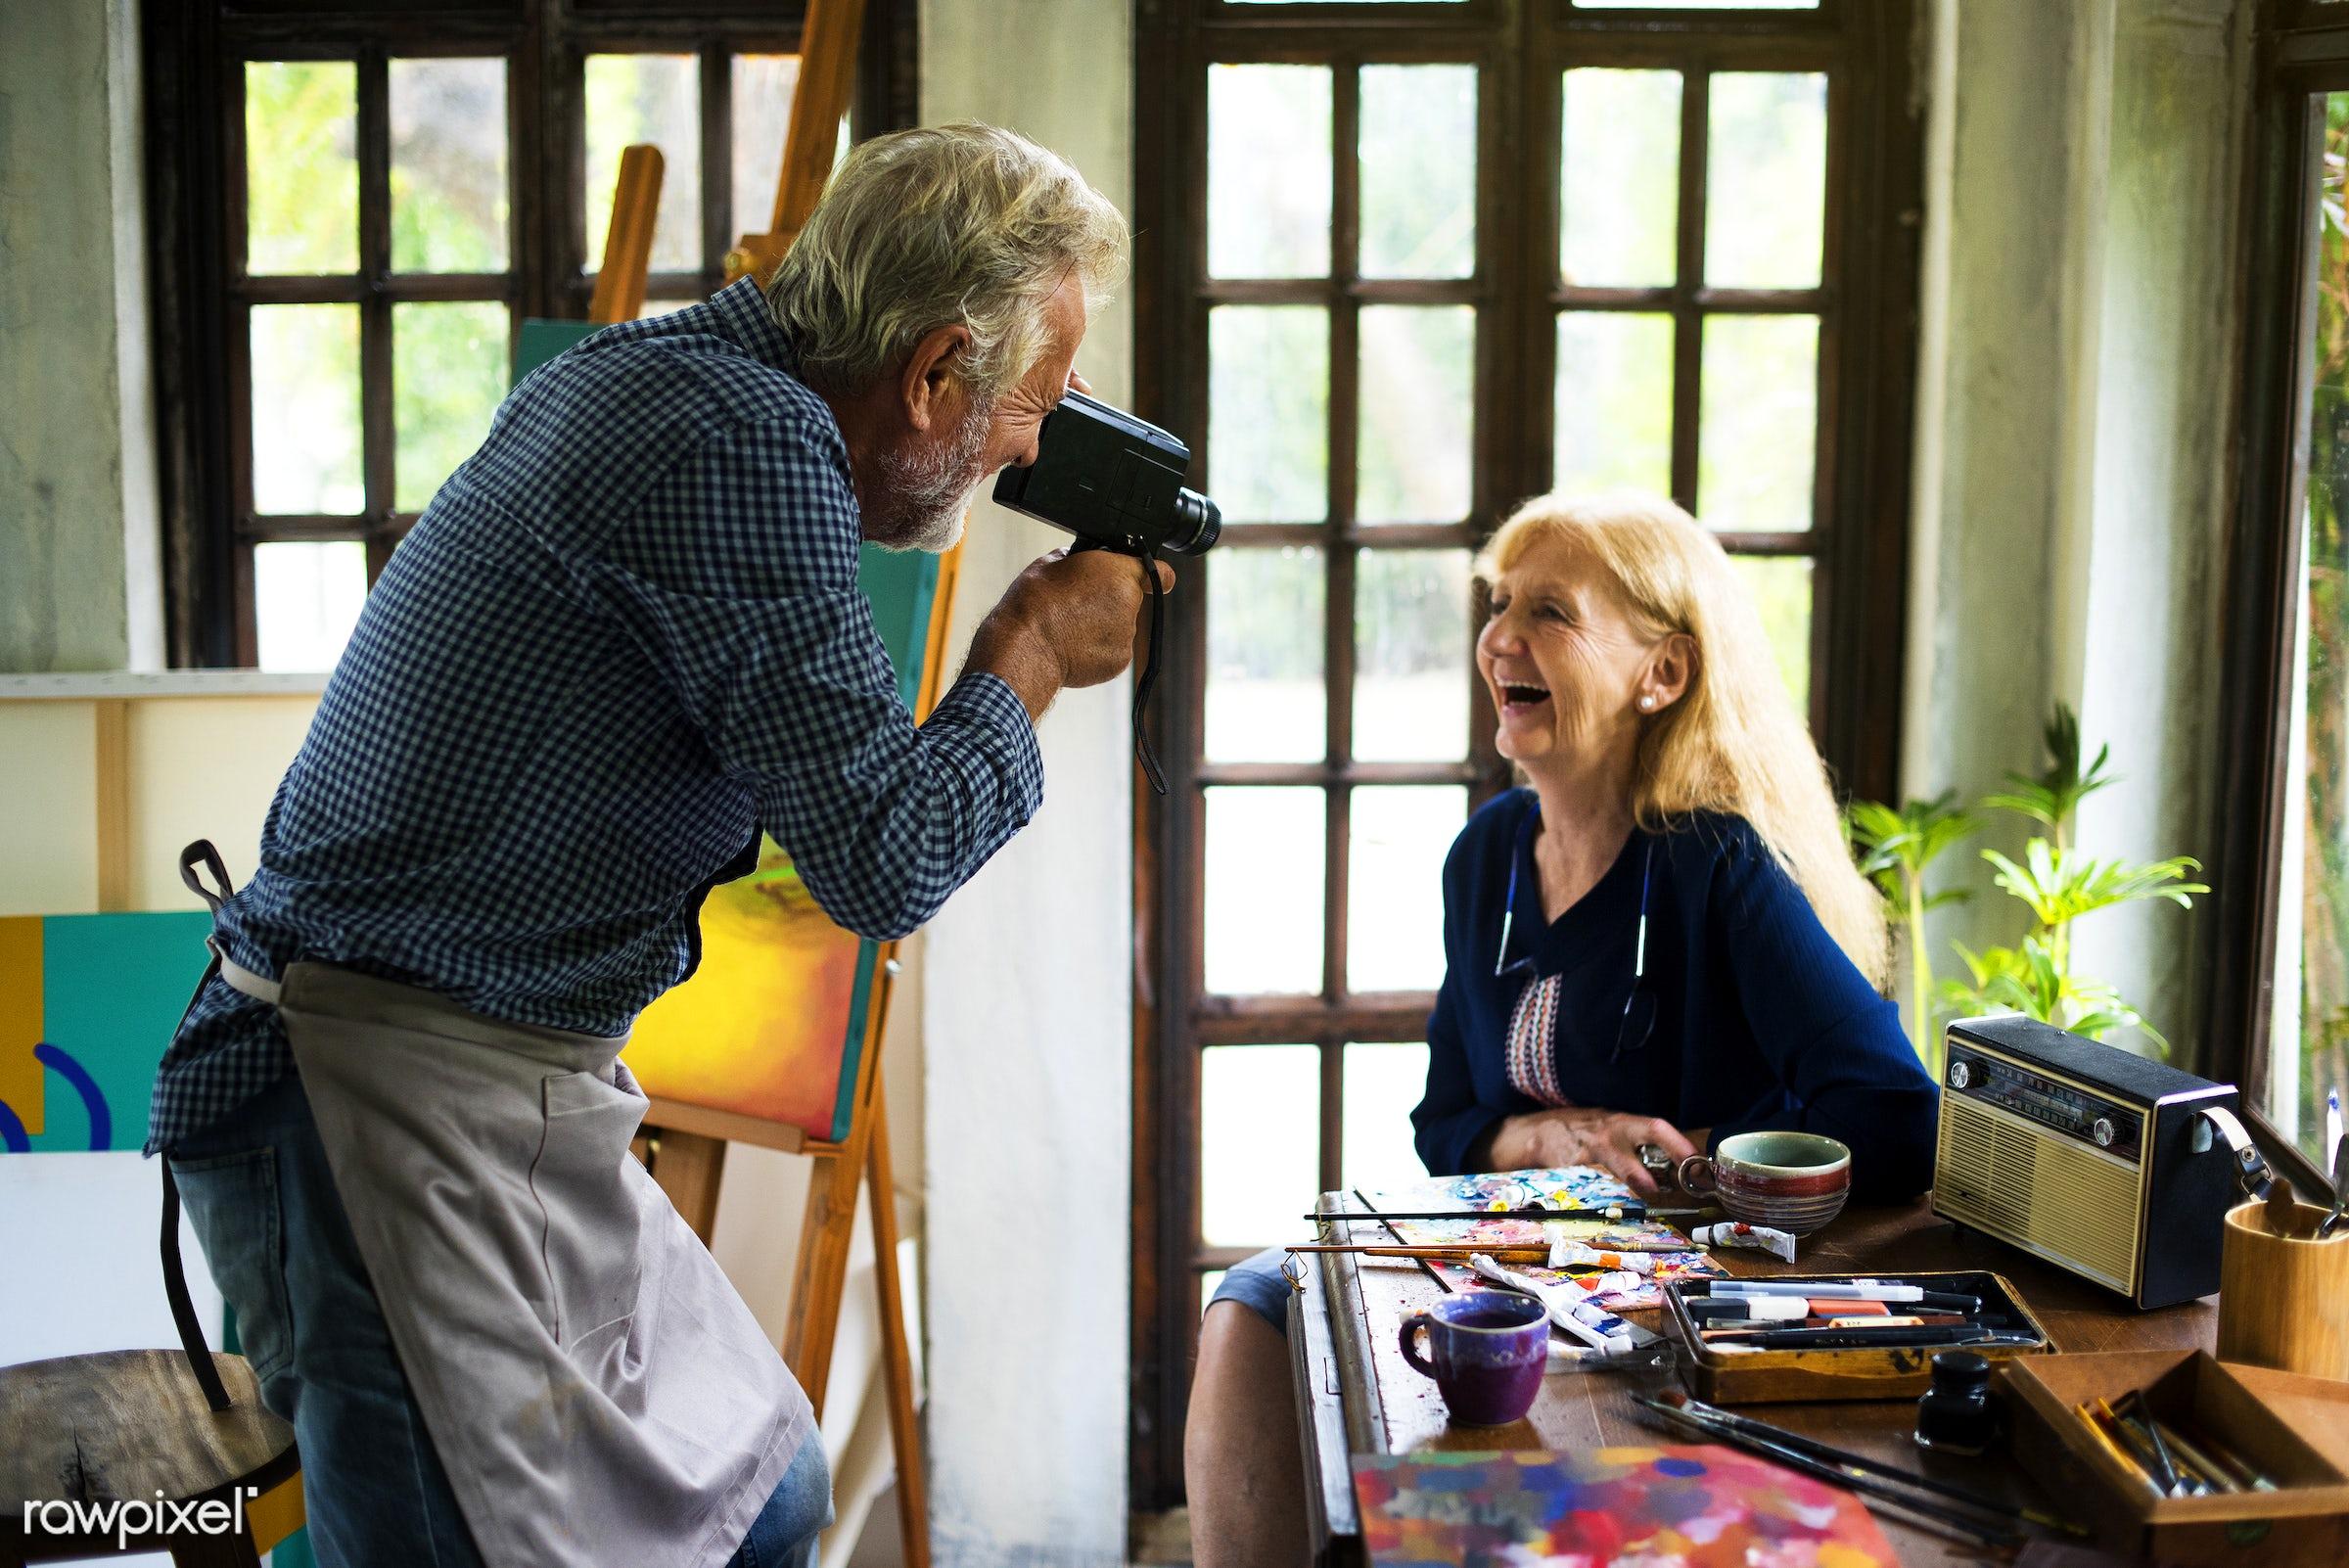 colorful, workspace, palette, recreation, hands, couple, artist, painter, closeup, work, creative, art, camera, hobby,...